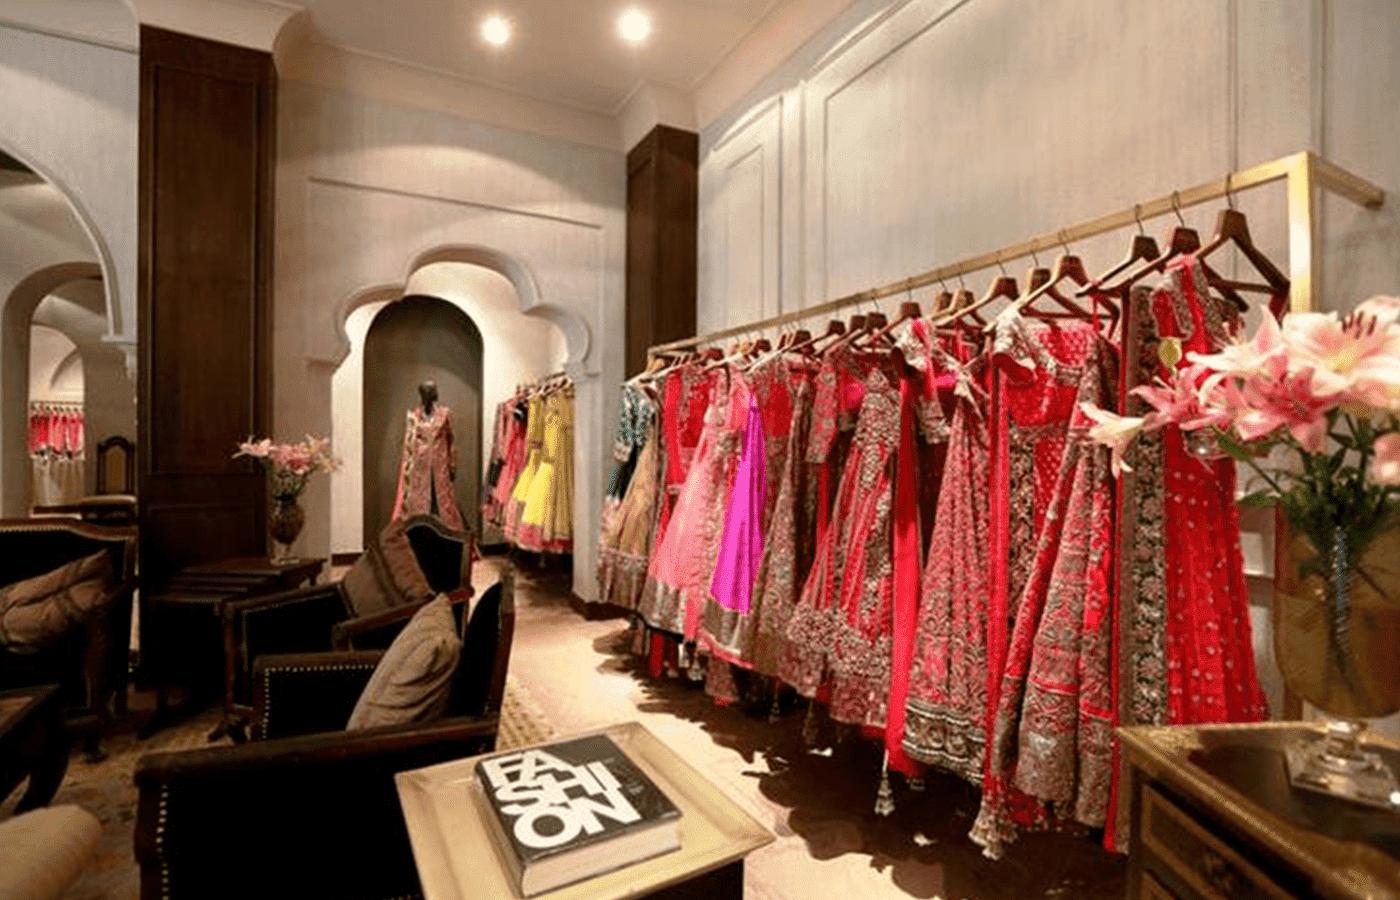 indian-clothing-store-interior-design-for-ladies-garment-shop-1-750x469